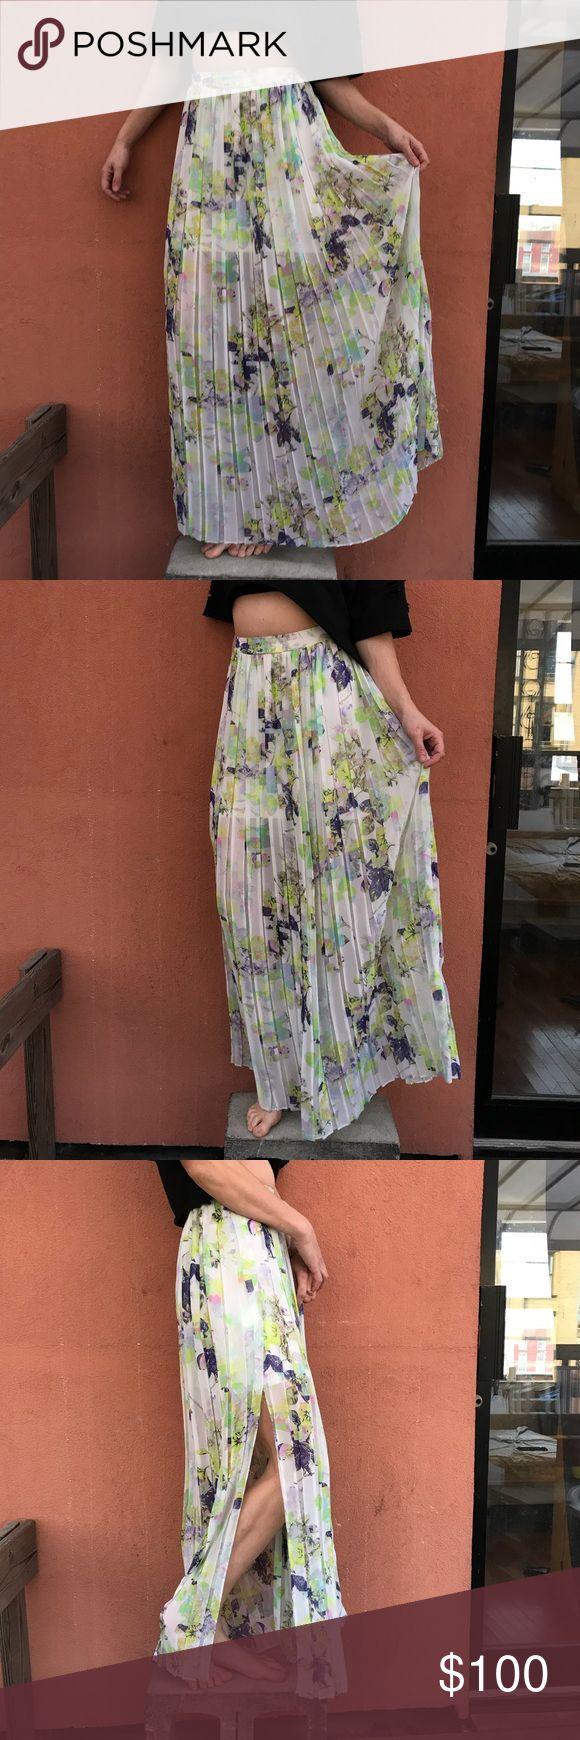 BGBGeneration pleated floral maxi skirt. Size XS BGBGeneration pleated floral maxi skirt. Size XS. Worn twice  #bcbgeneration #bcbg #fall #fallfashion #fallstyle #fashion #style #depop #skirt #maxi #pleated #floral #white #green BCBGeneration Skirts Maxi